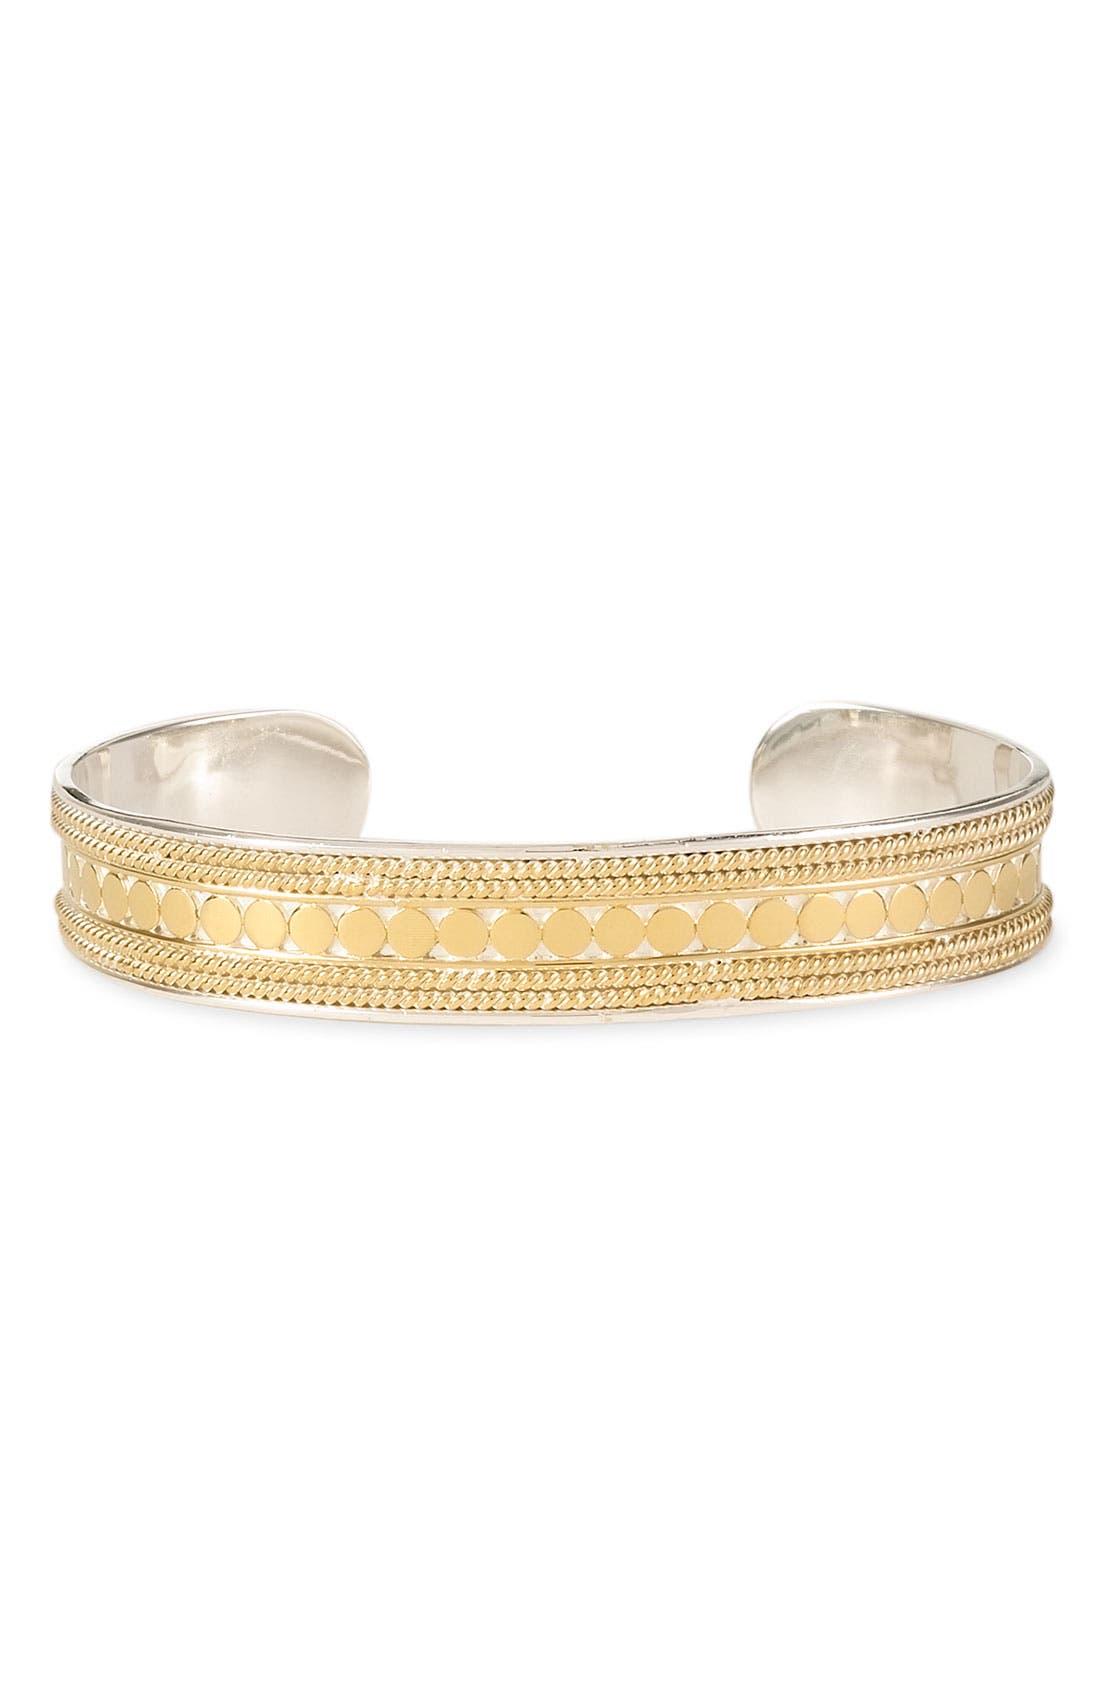 Anna Beck 'Gili' Skinny Cuff Bracelet